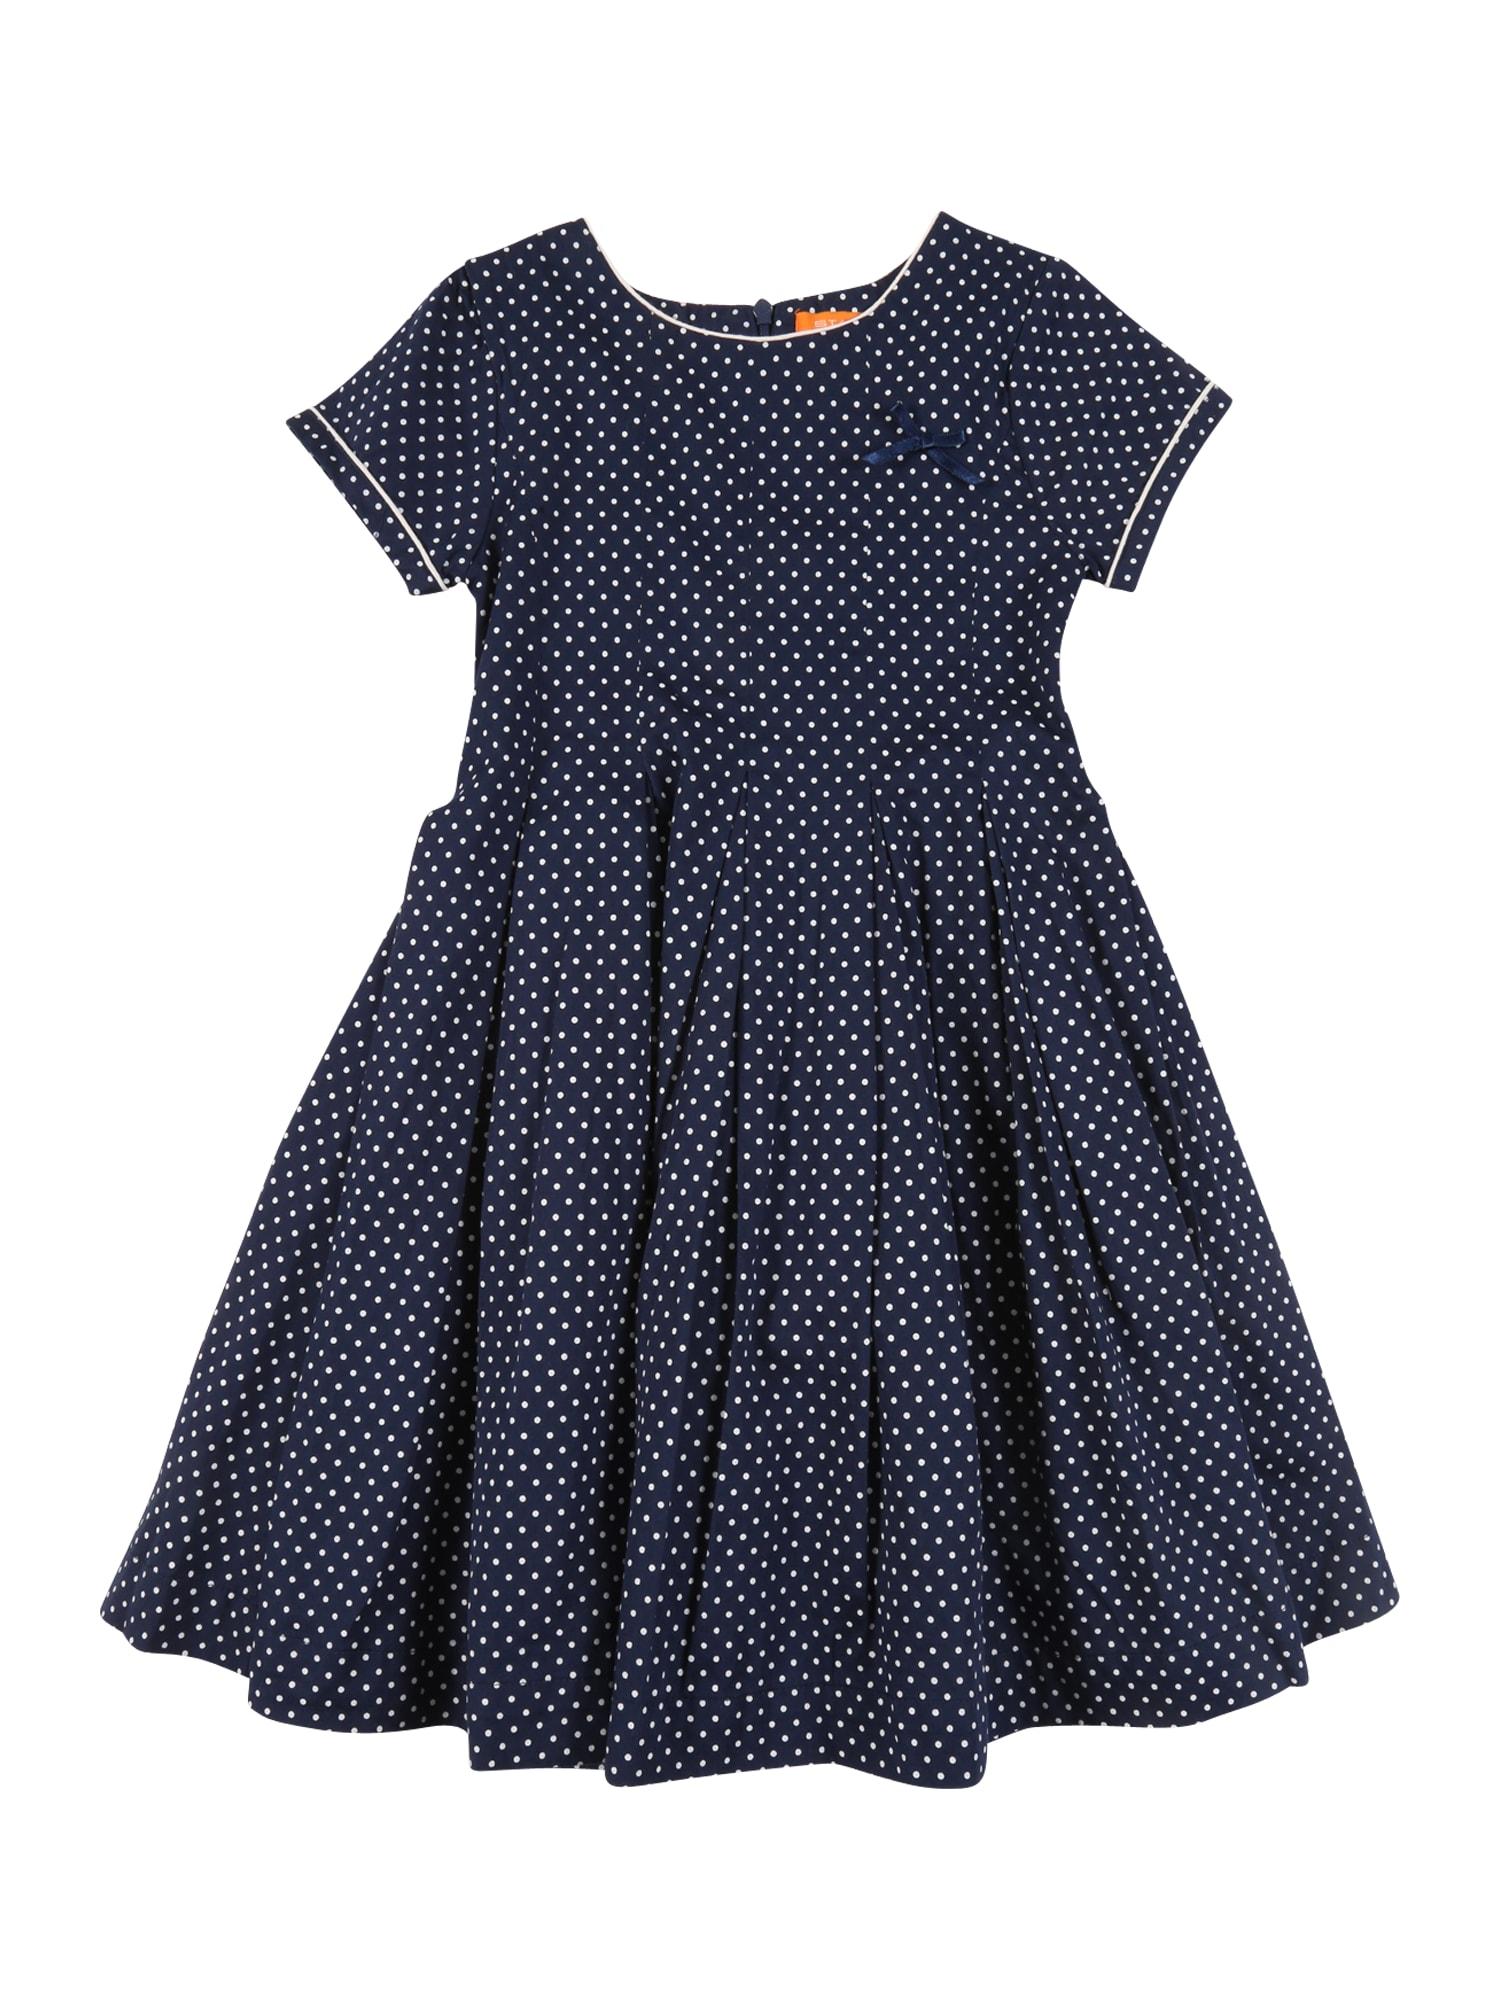 STACCATO Suknelė tamsiai mėlyna / balta